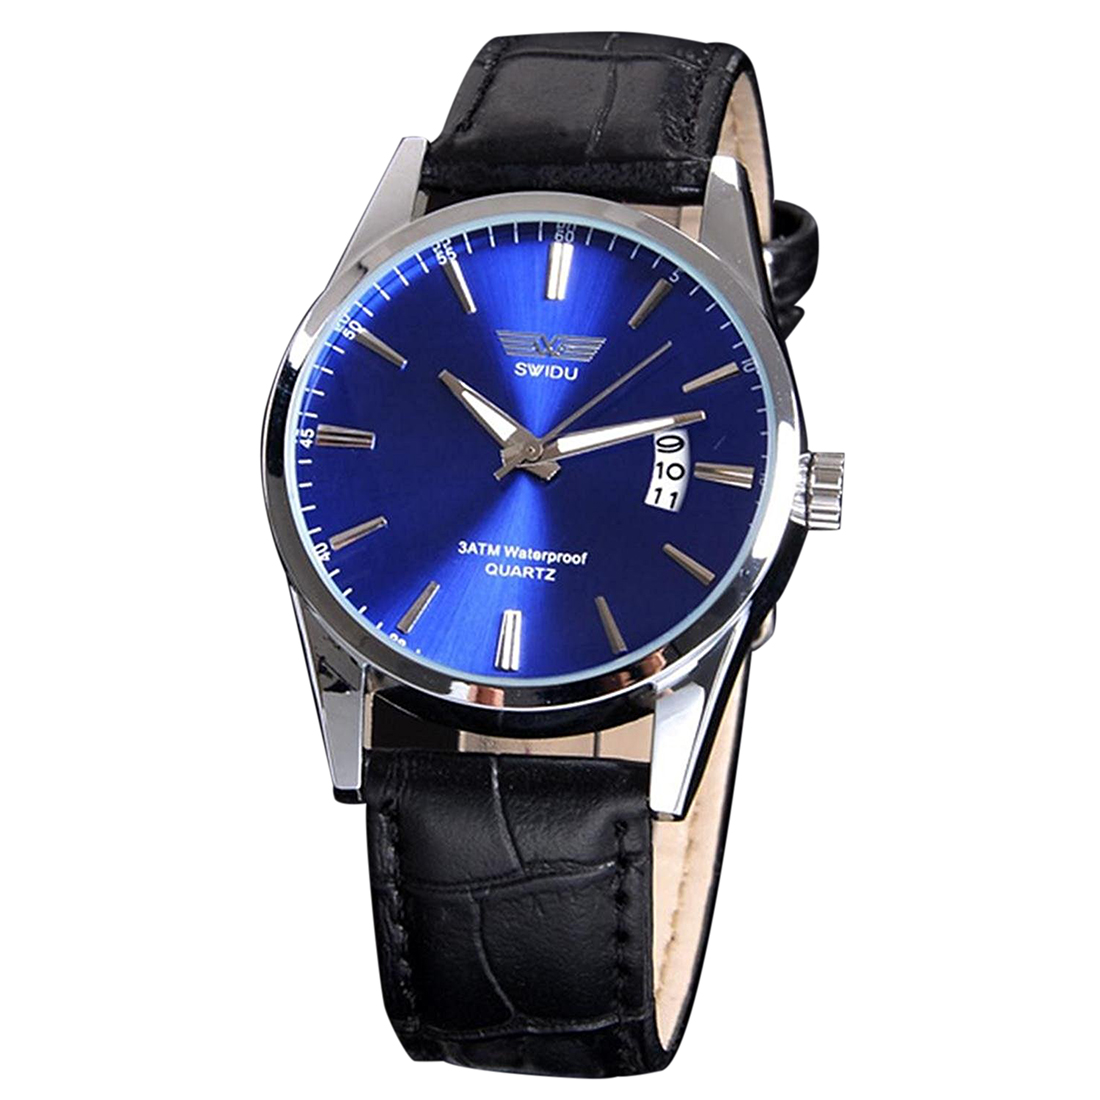 SWIDU Mens Fashion Stainless Steel Luxury Sport Analog Quartz Wrist Watch (Blue) xiniu men s fashion luxury watch stainless steel sport analog quartz mens wristwatch